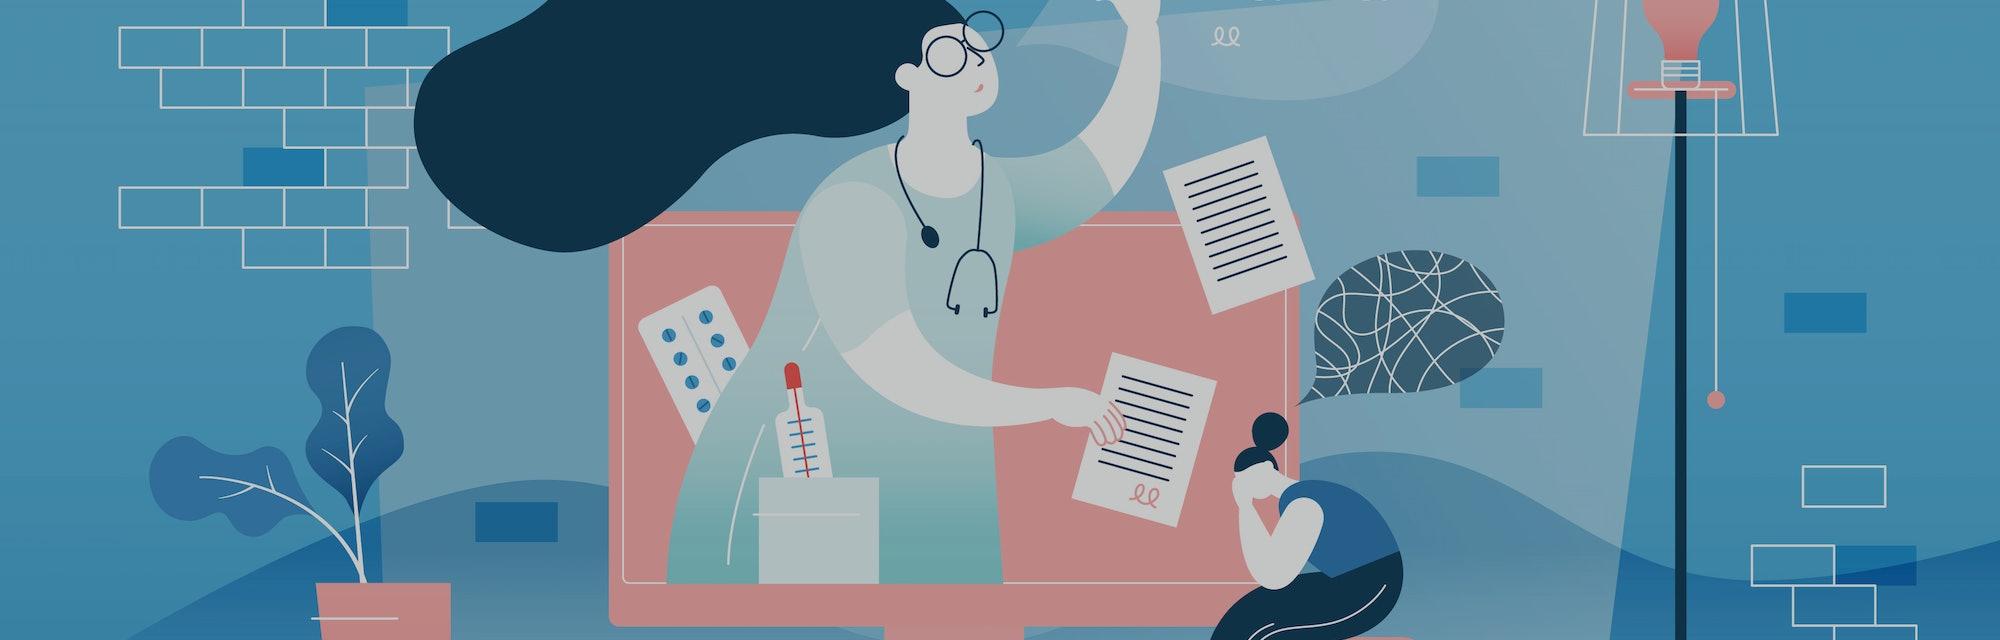 Online doctor vector illustration. Flat tiny medical help persons concept. Distance internet emergen...